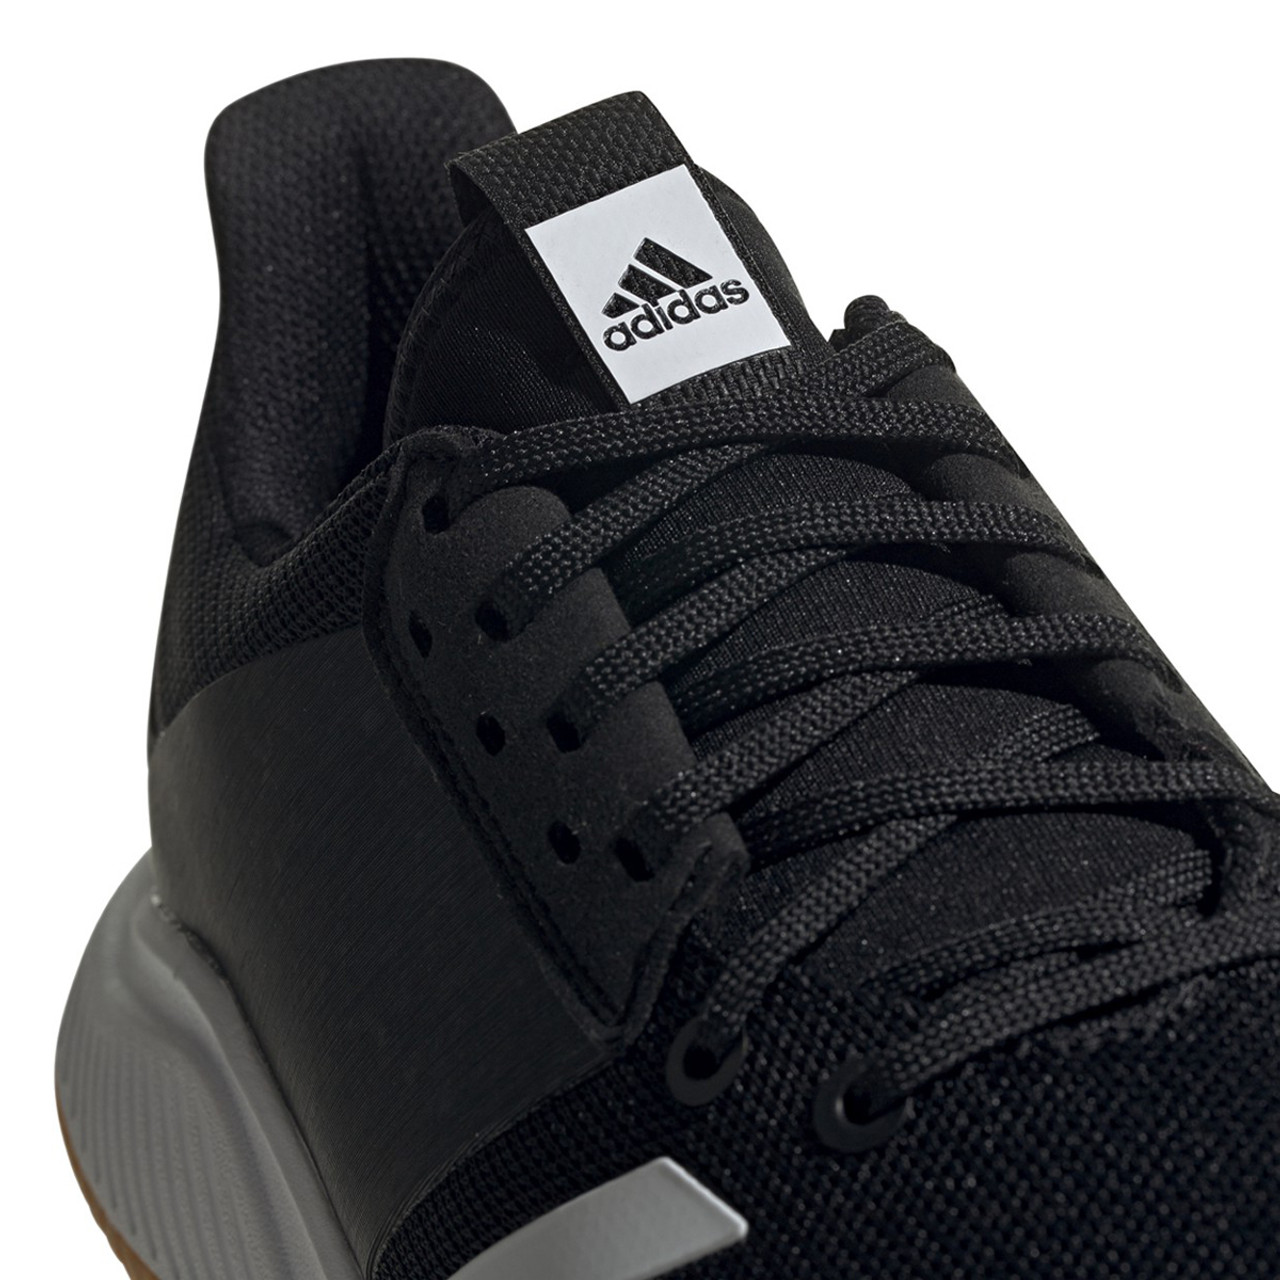 Adidas Crazyflight Team Women's Volleyball Shoes D97701 Black, White, Gum